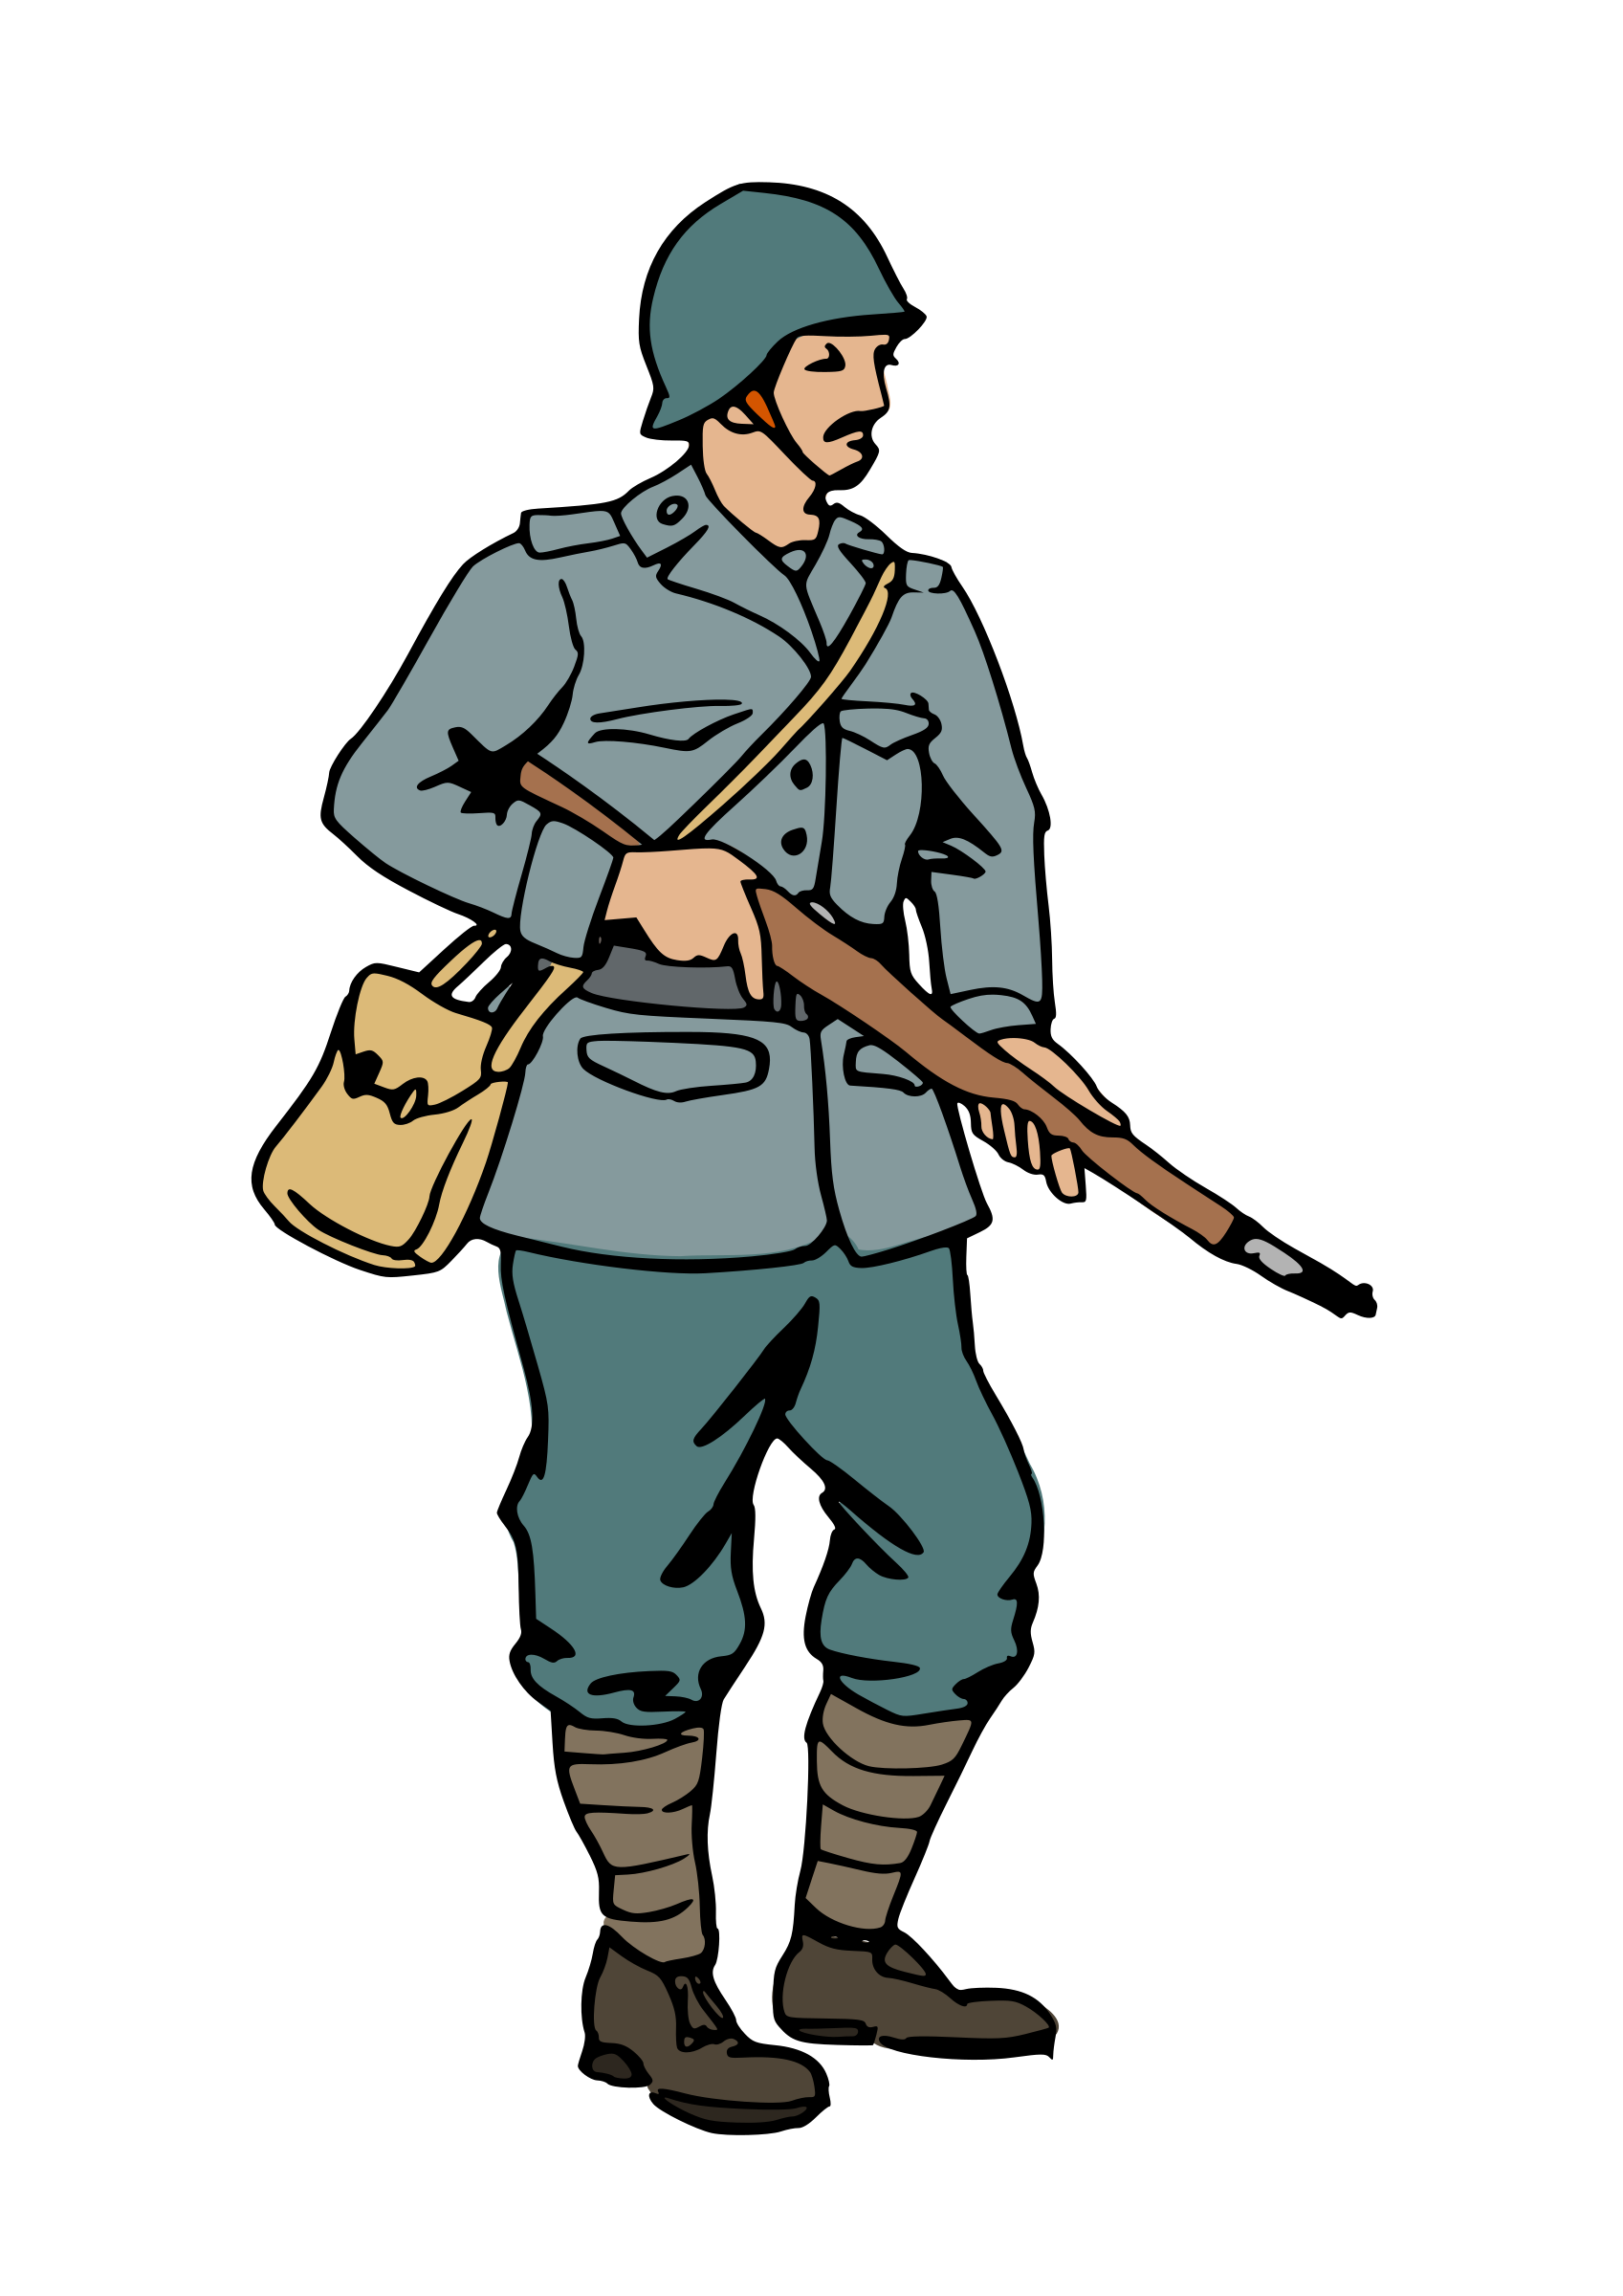 Free World War 2 Cliparts, Download Free Clip Art, Free Clip.